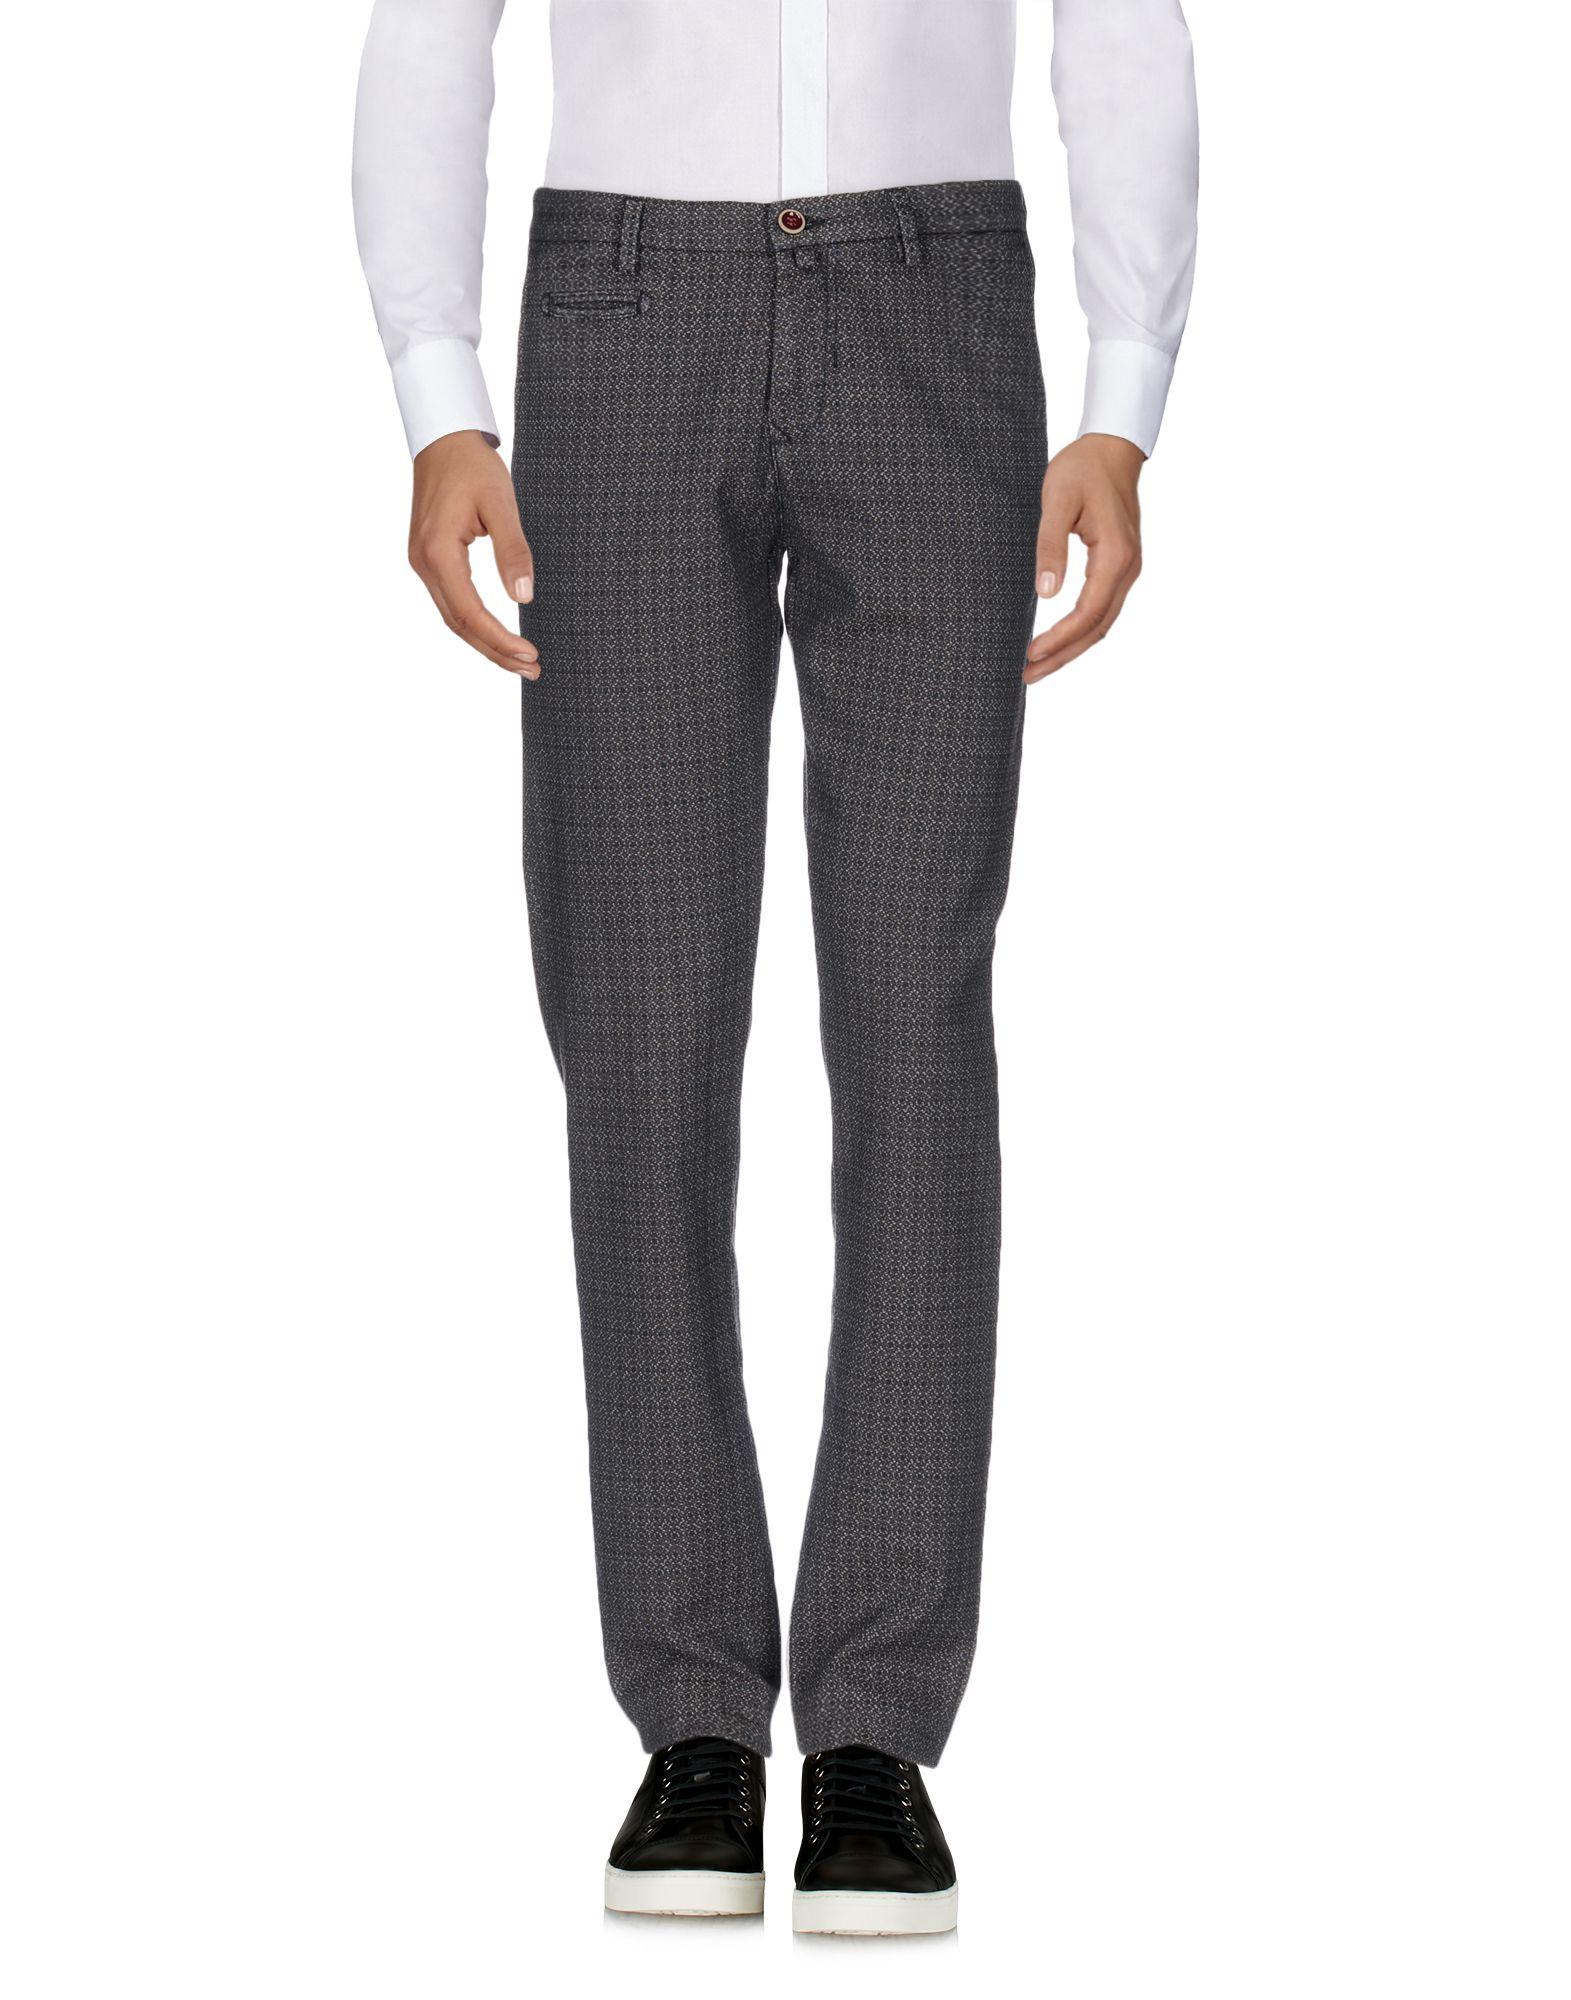 PANTALONES - Pantalones B-CHOST qtd3J6i